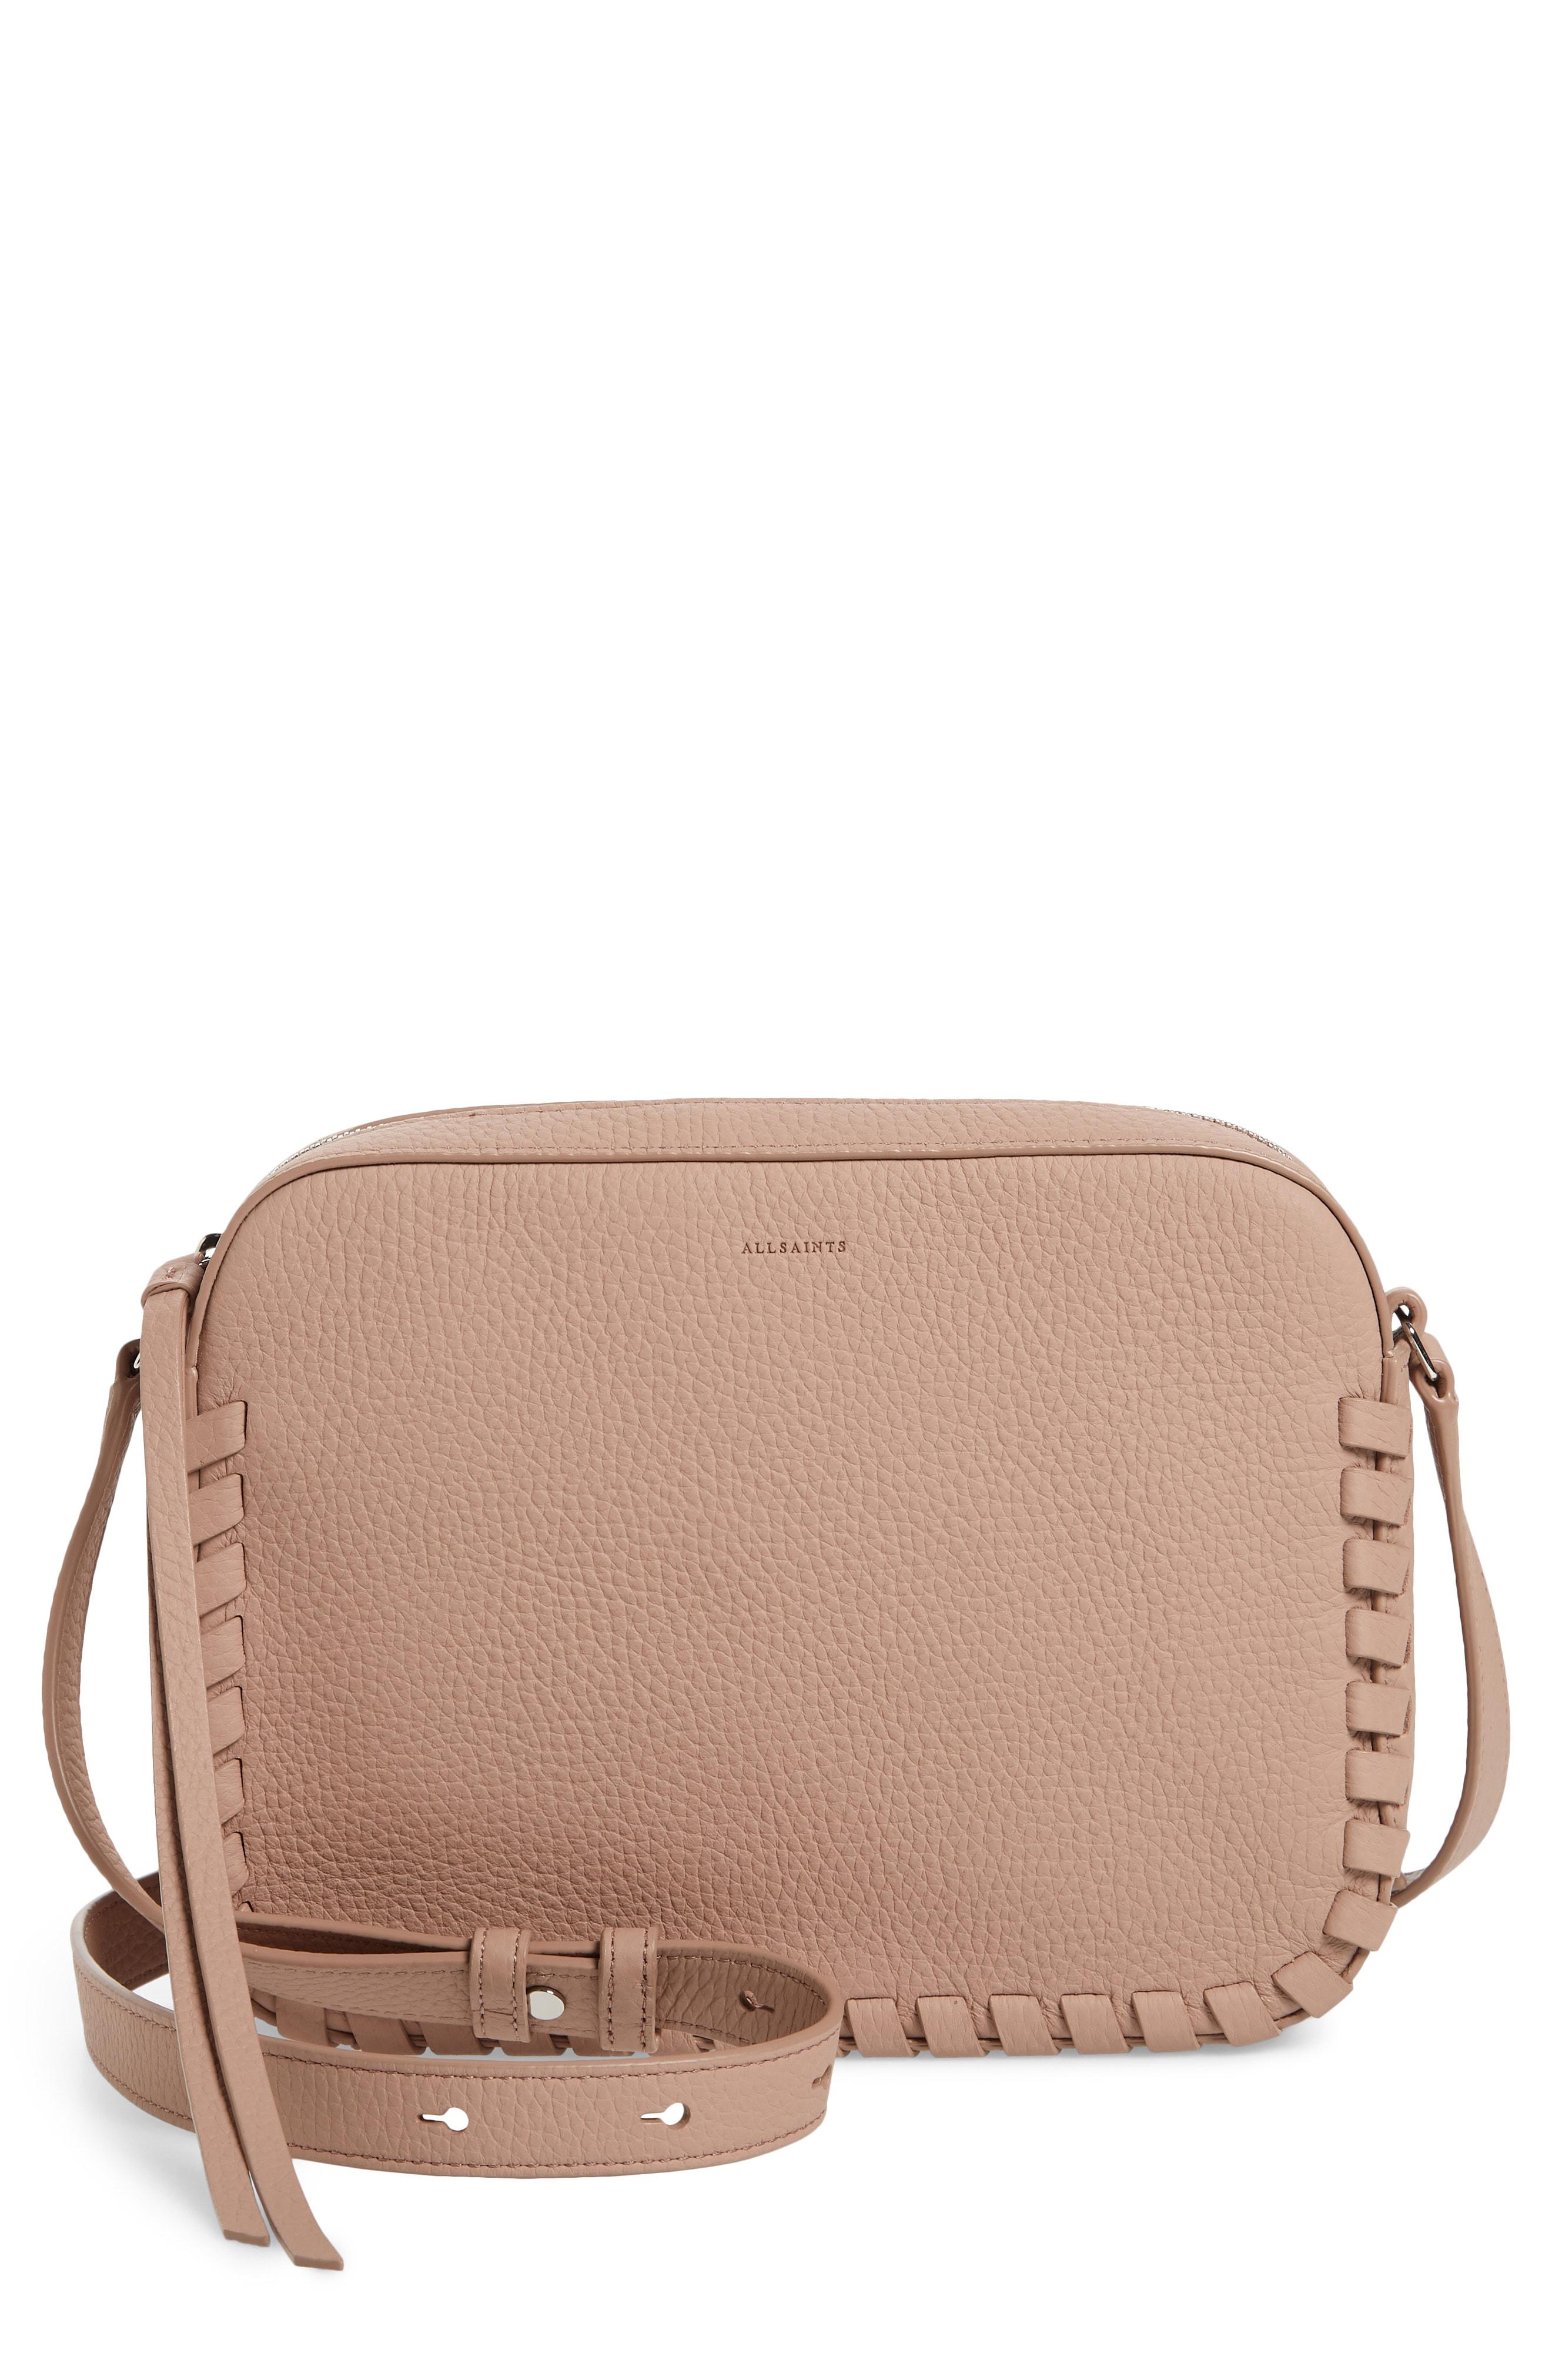 ALLSAINTS Kepi Mini Leather Crossbody Bag